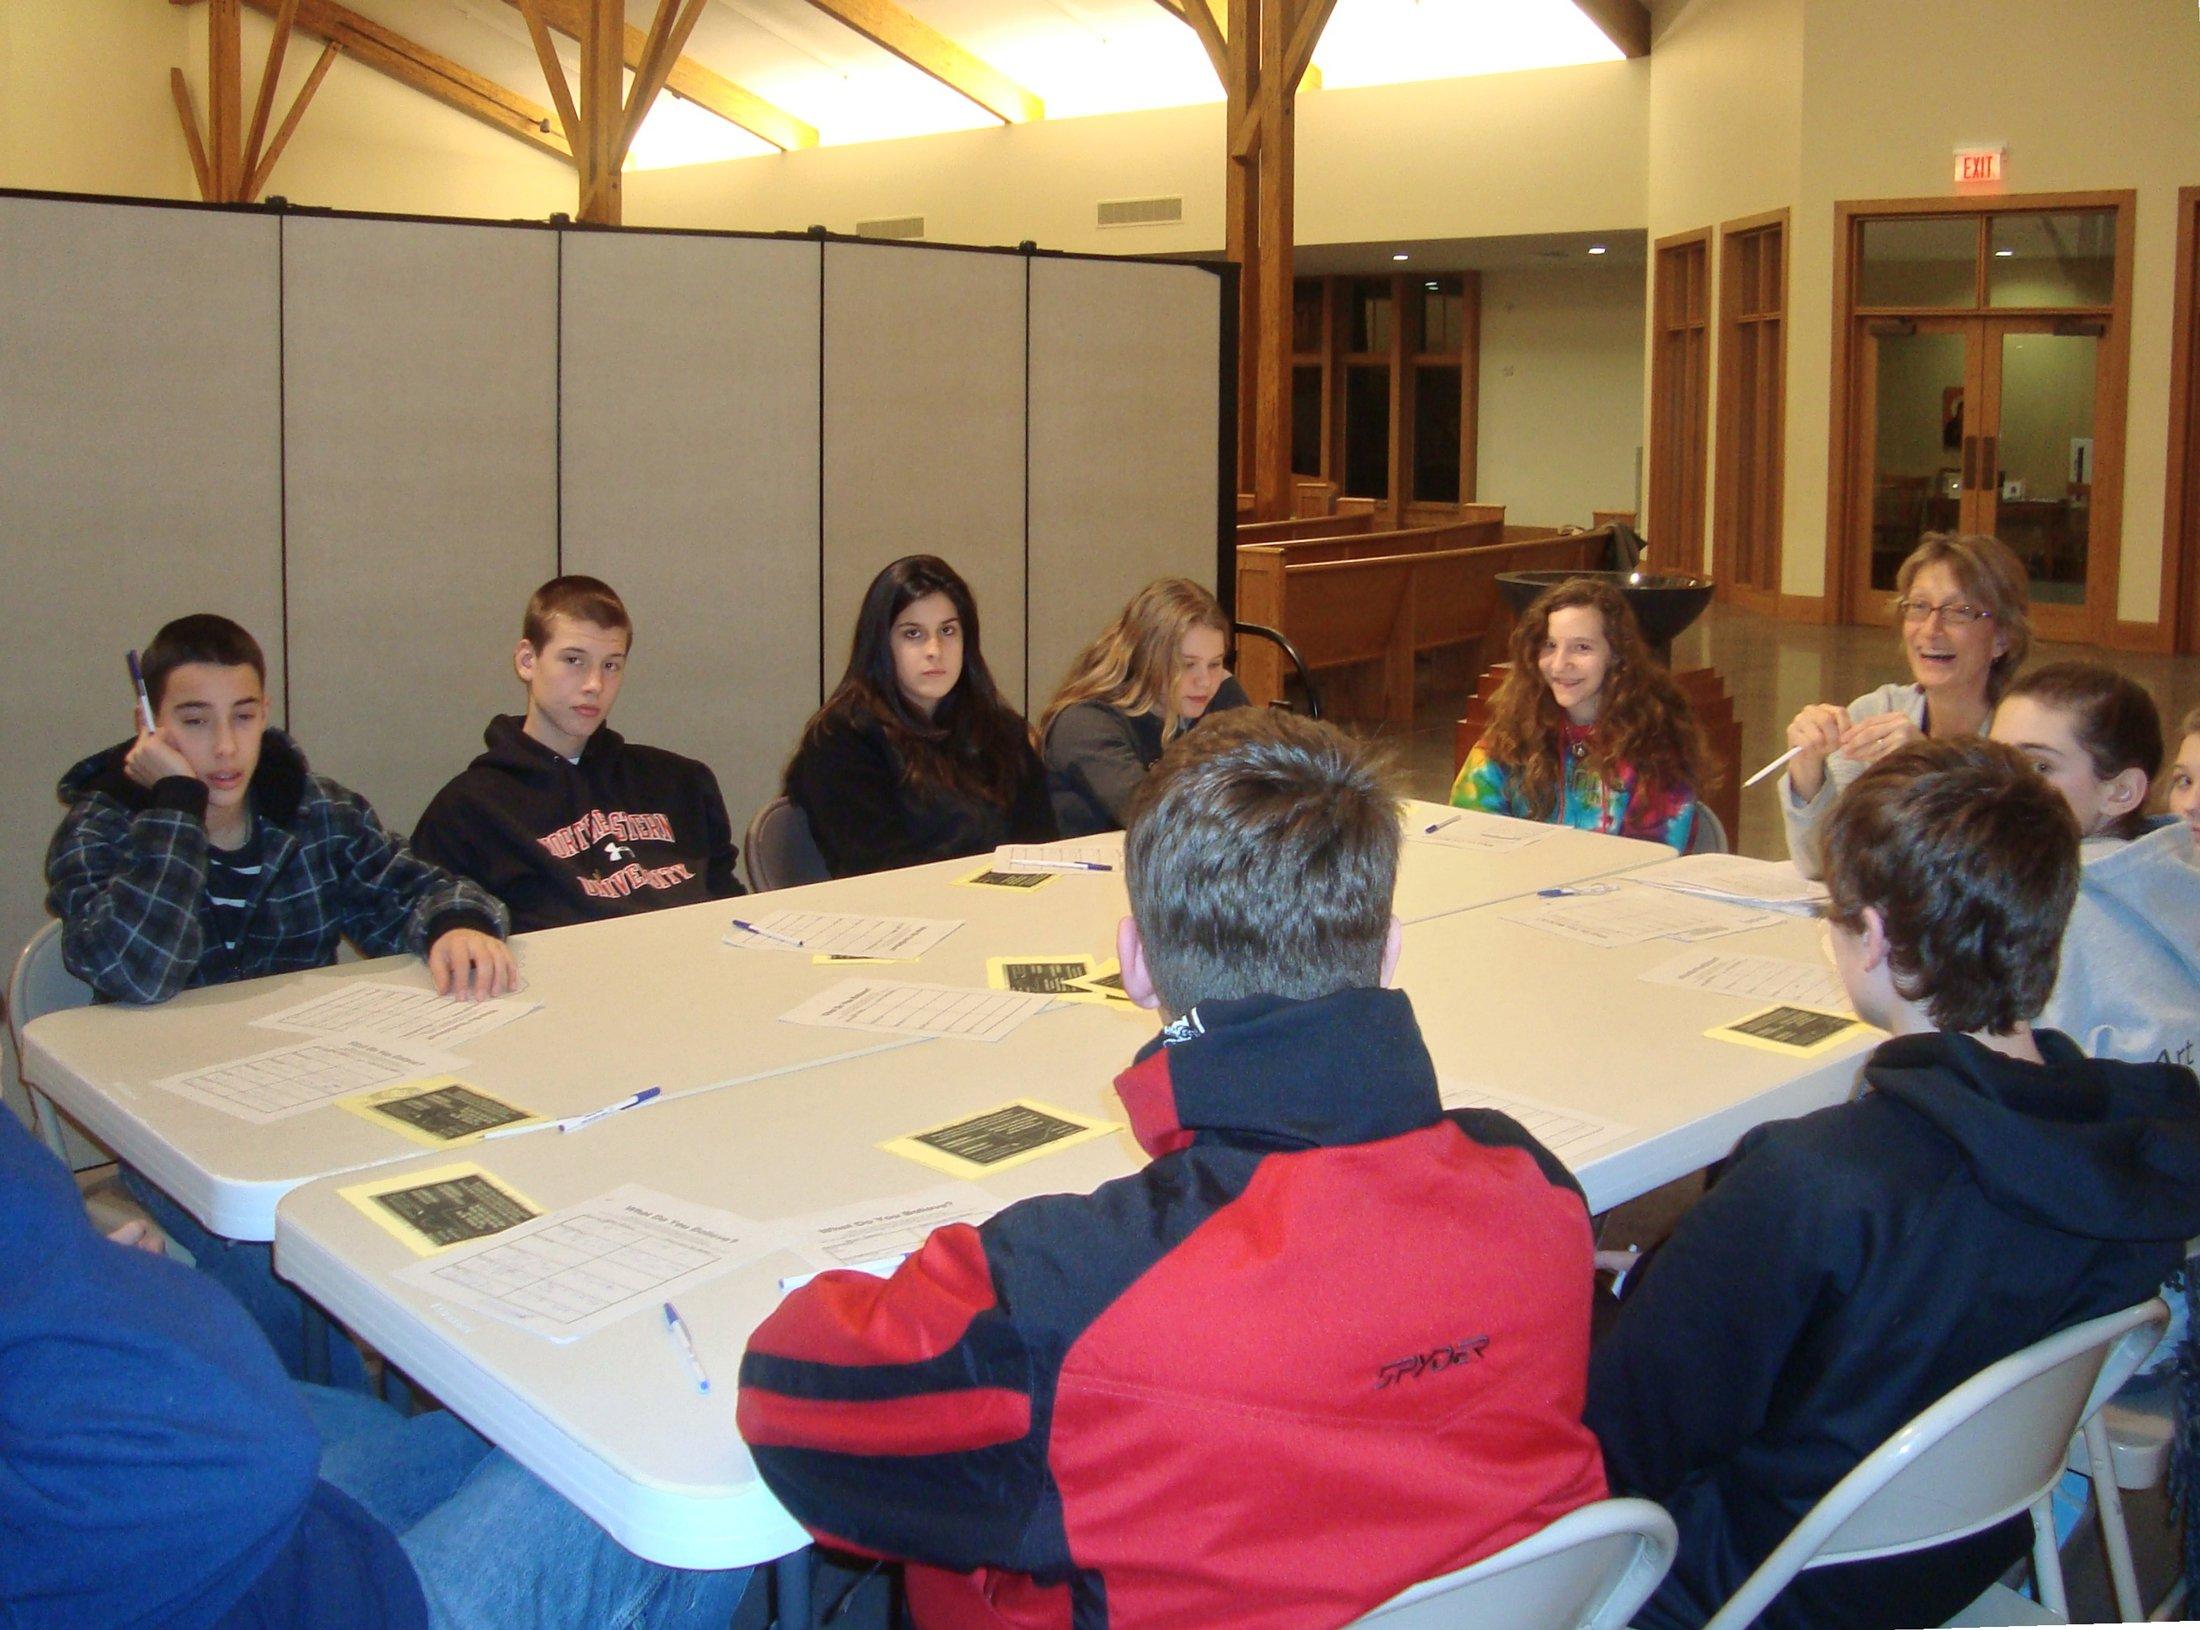 Confirmation Class Church Room Divider